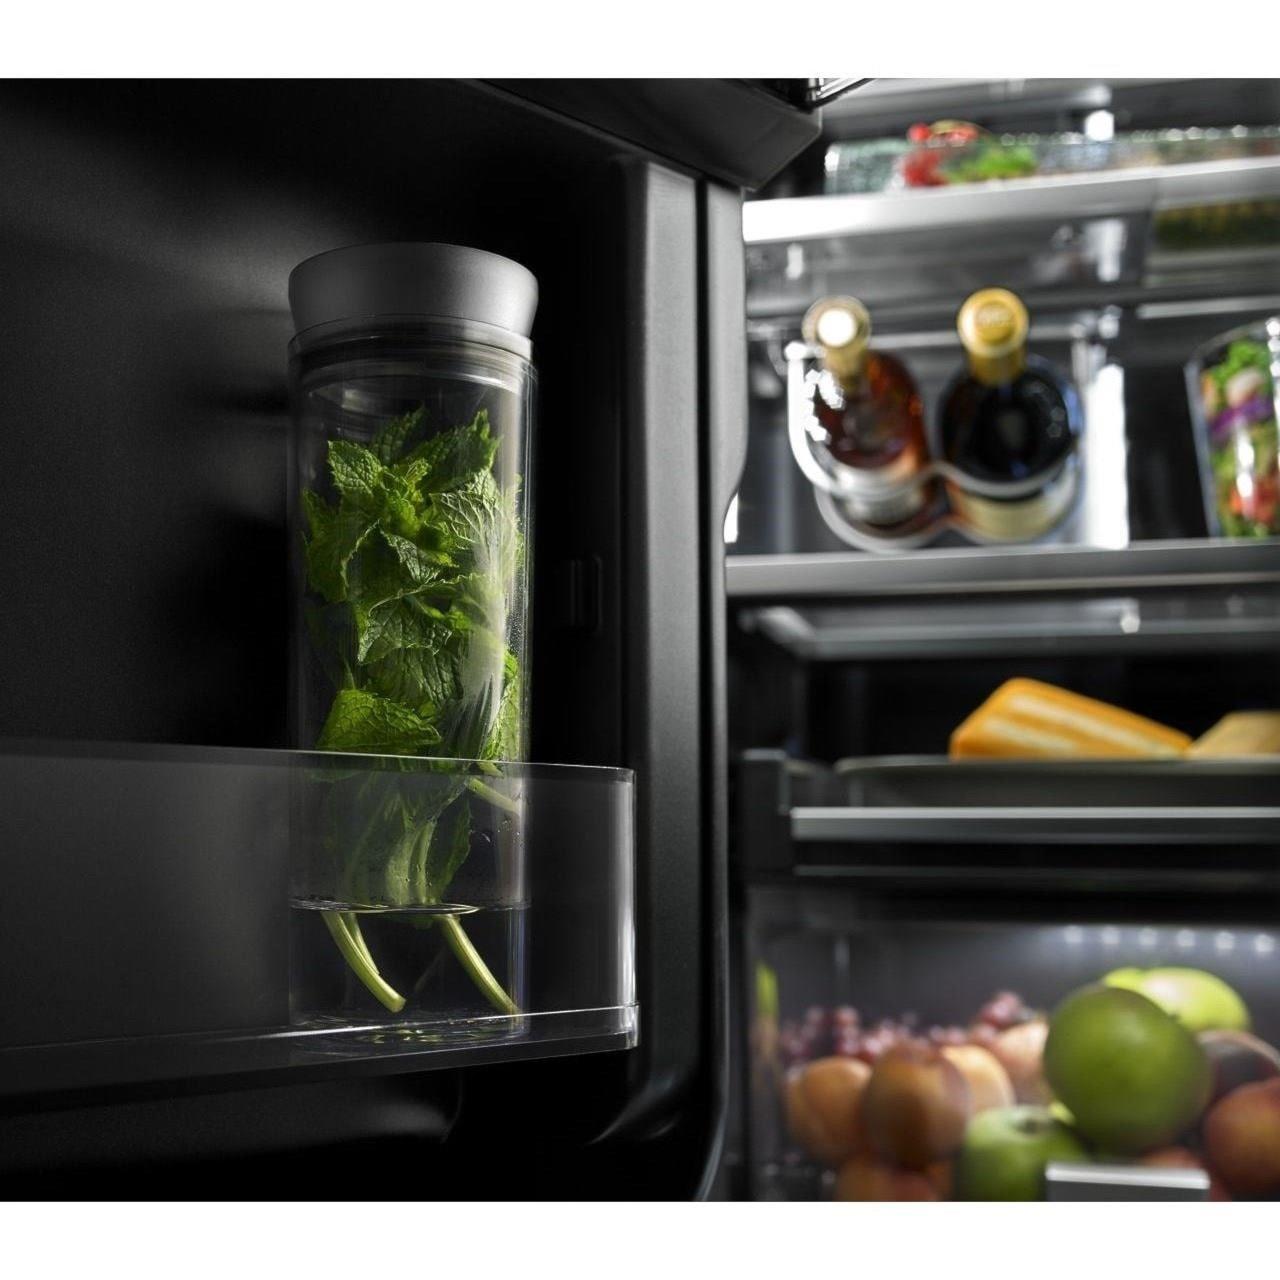 jenn air jfc2089bem. shown in: jenn-air refrigerators - french door 72\u201d counter-depth refrigerator with obsidian interior jenn air jfc2089bem d